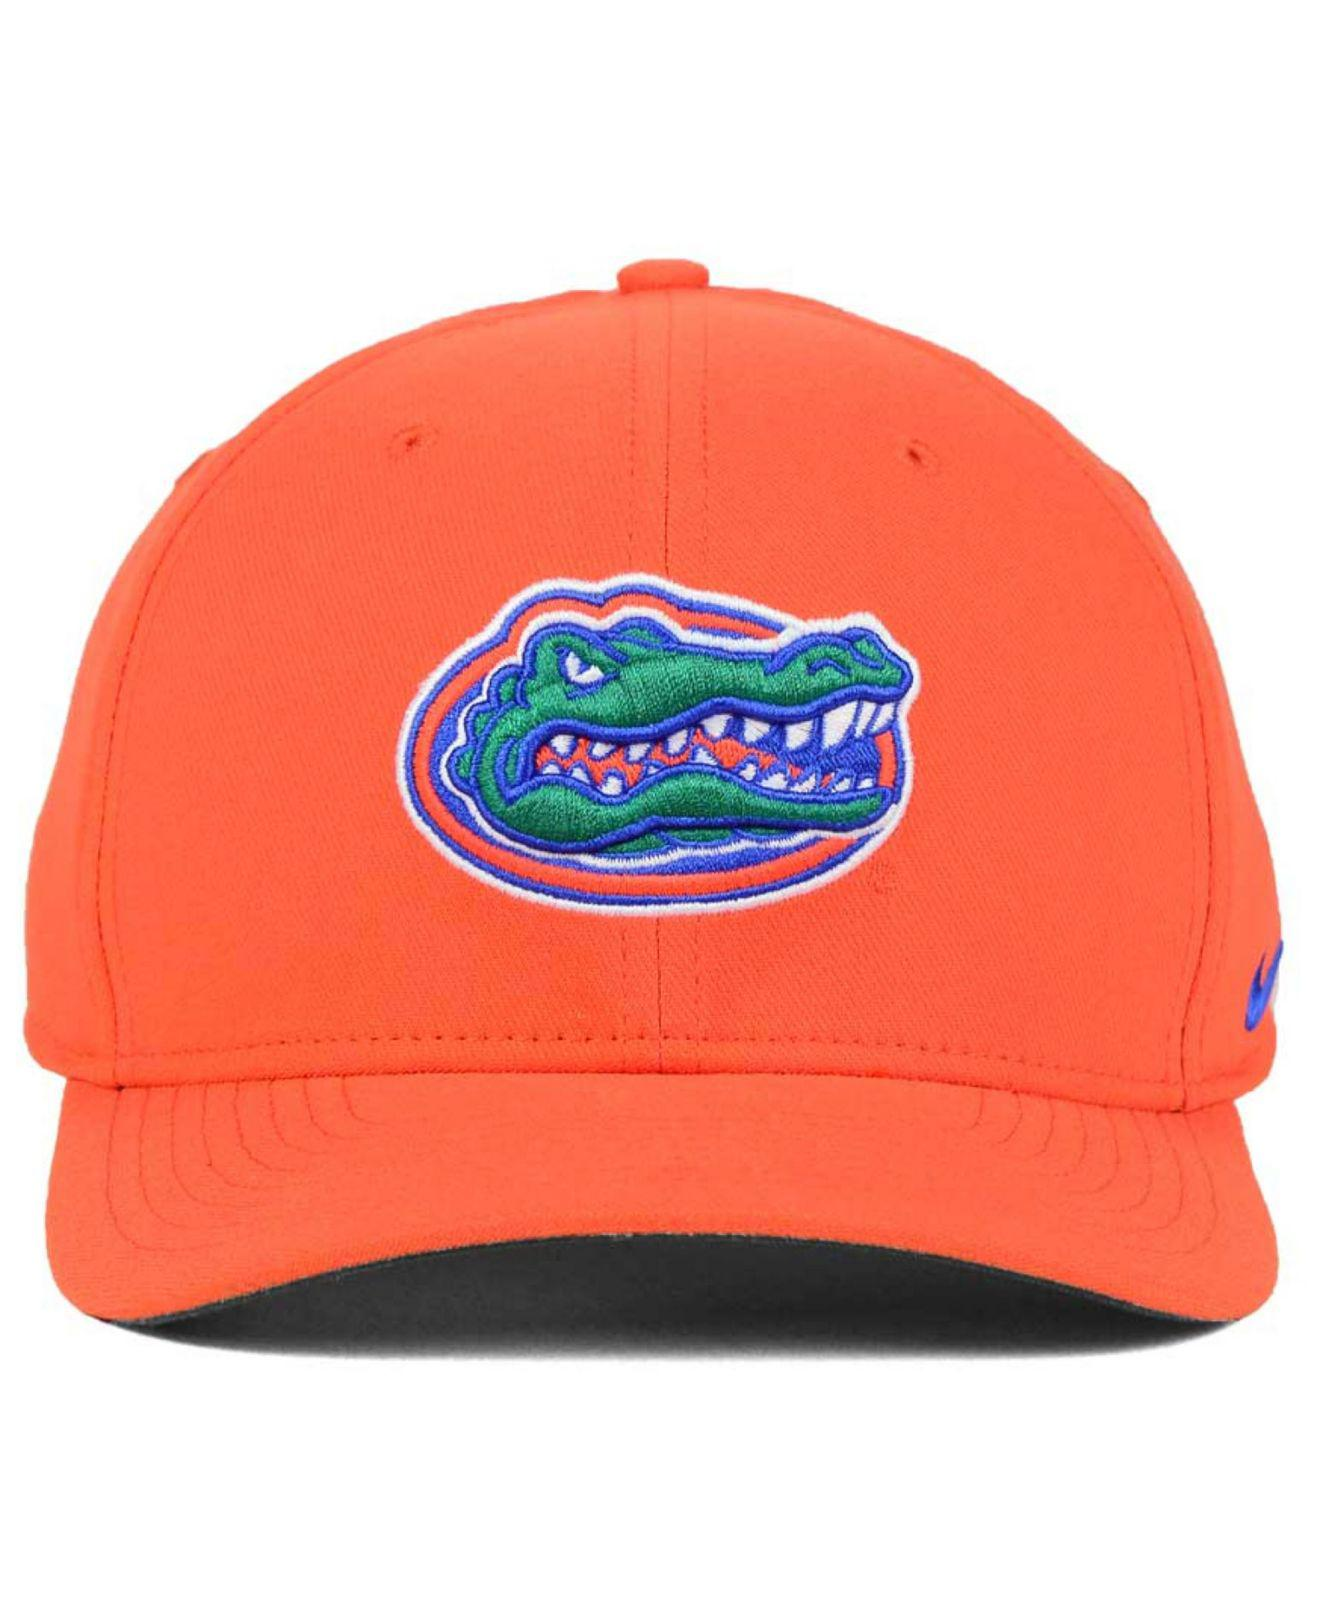 sports shoes 1ef64 8a984 ... hat 9681a 57012 greece lyst nike florida gators classic swoosh cap in  orange for men c998c 585bc ...